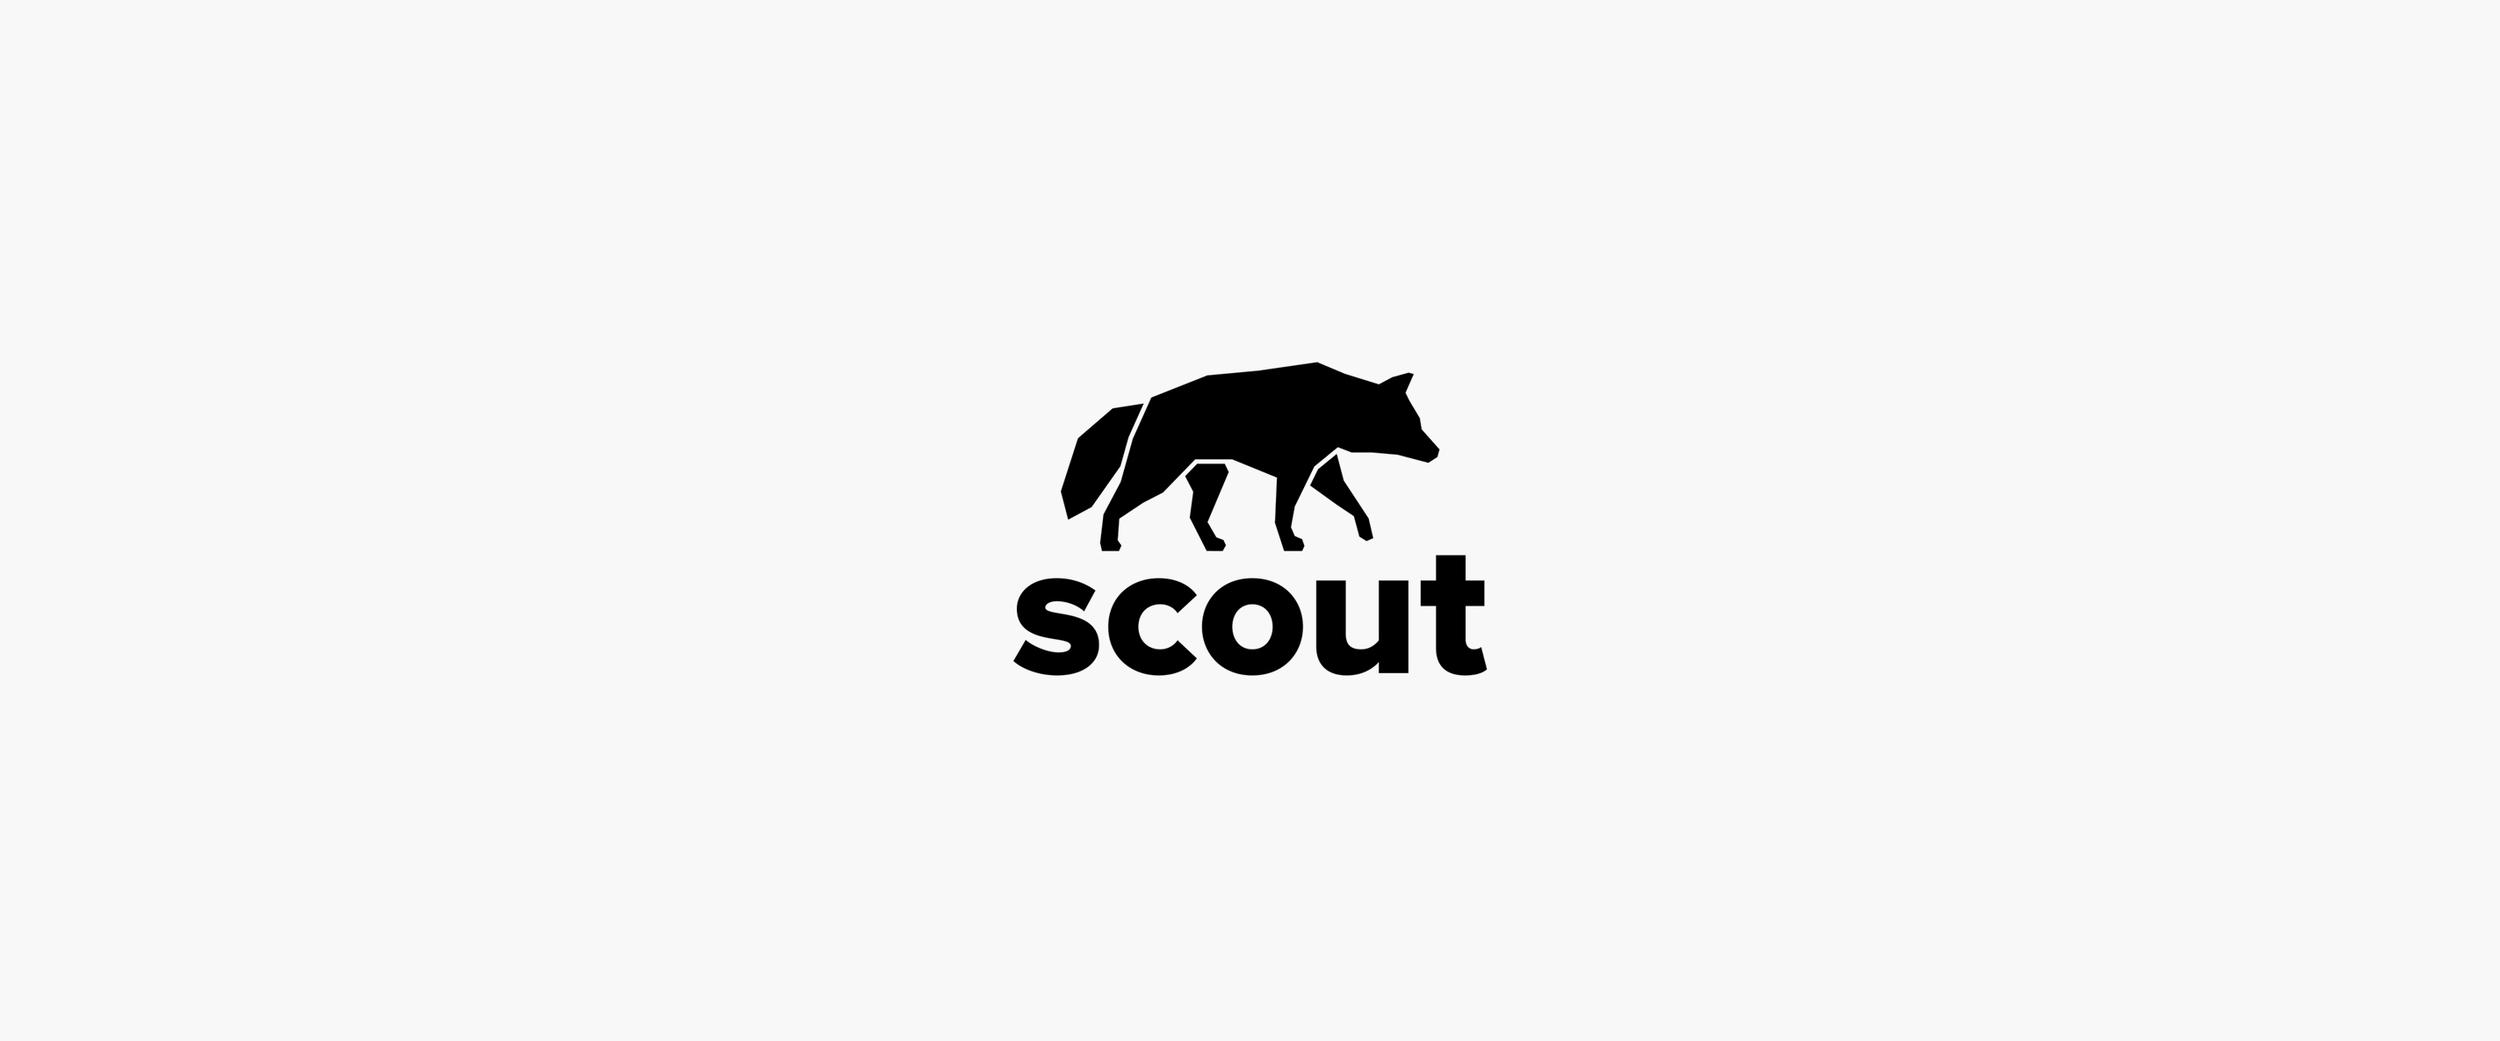 ScoutSecurityInc_JacquesLaramieLtd